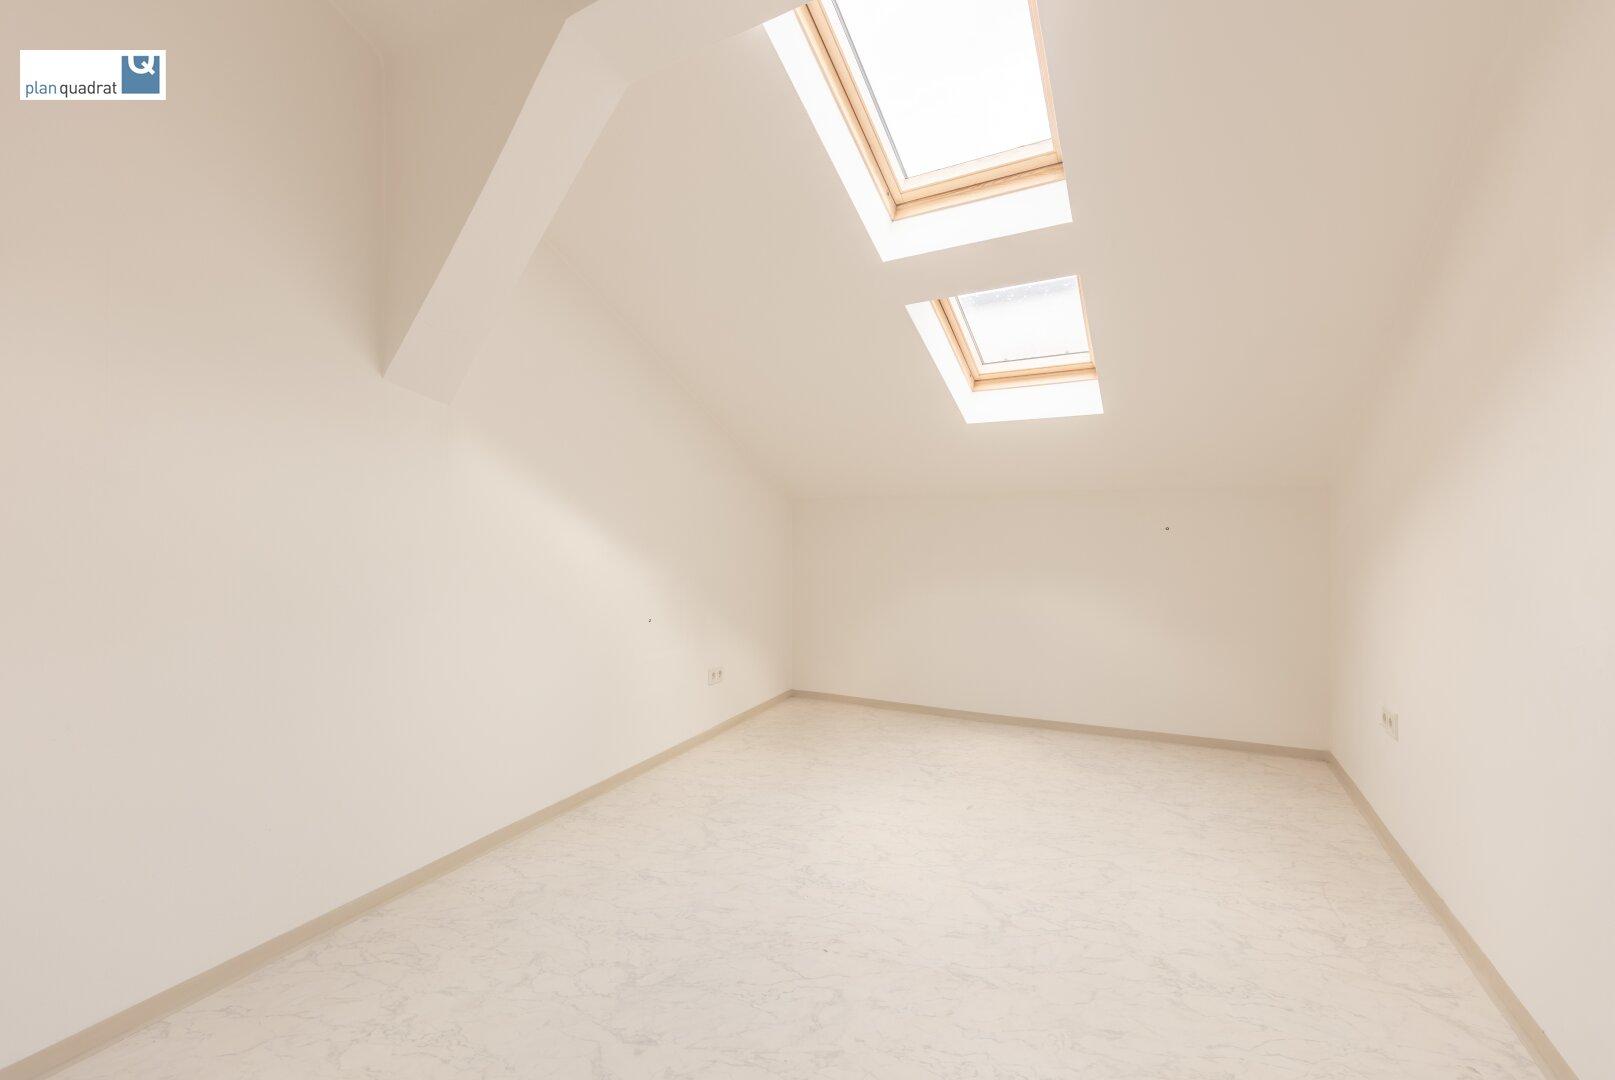 Atelier-Nebenraum (ca. 14,30 m²)